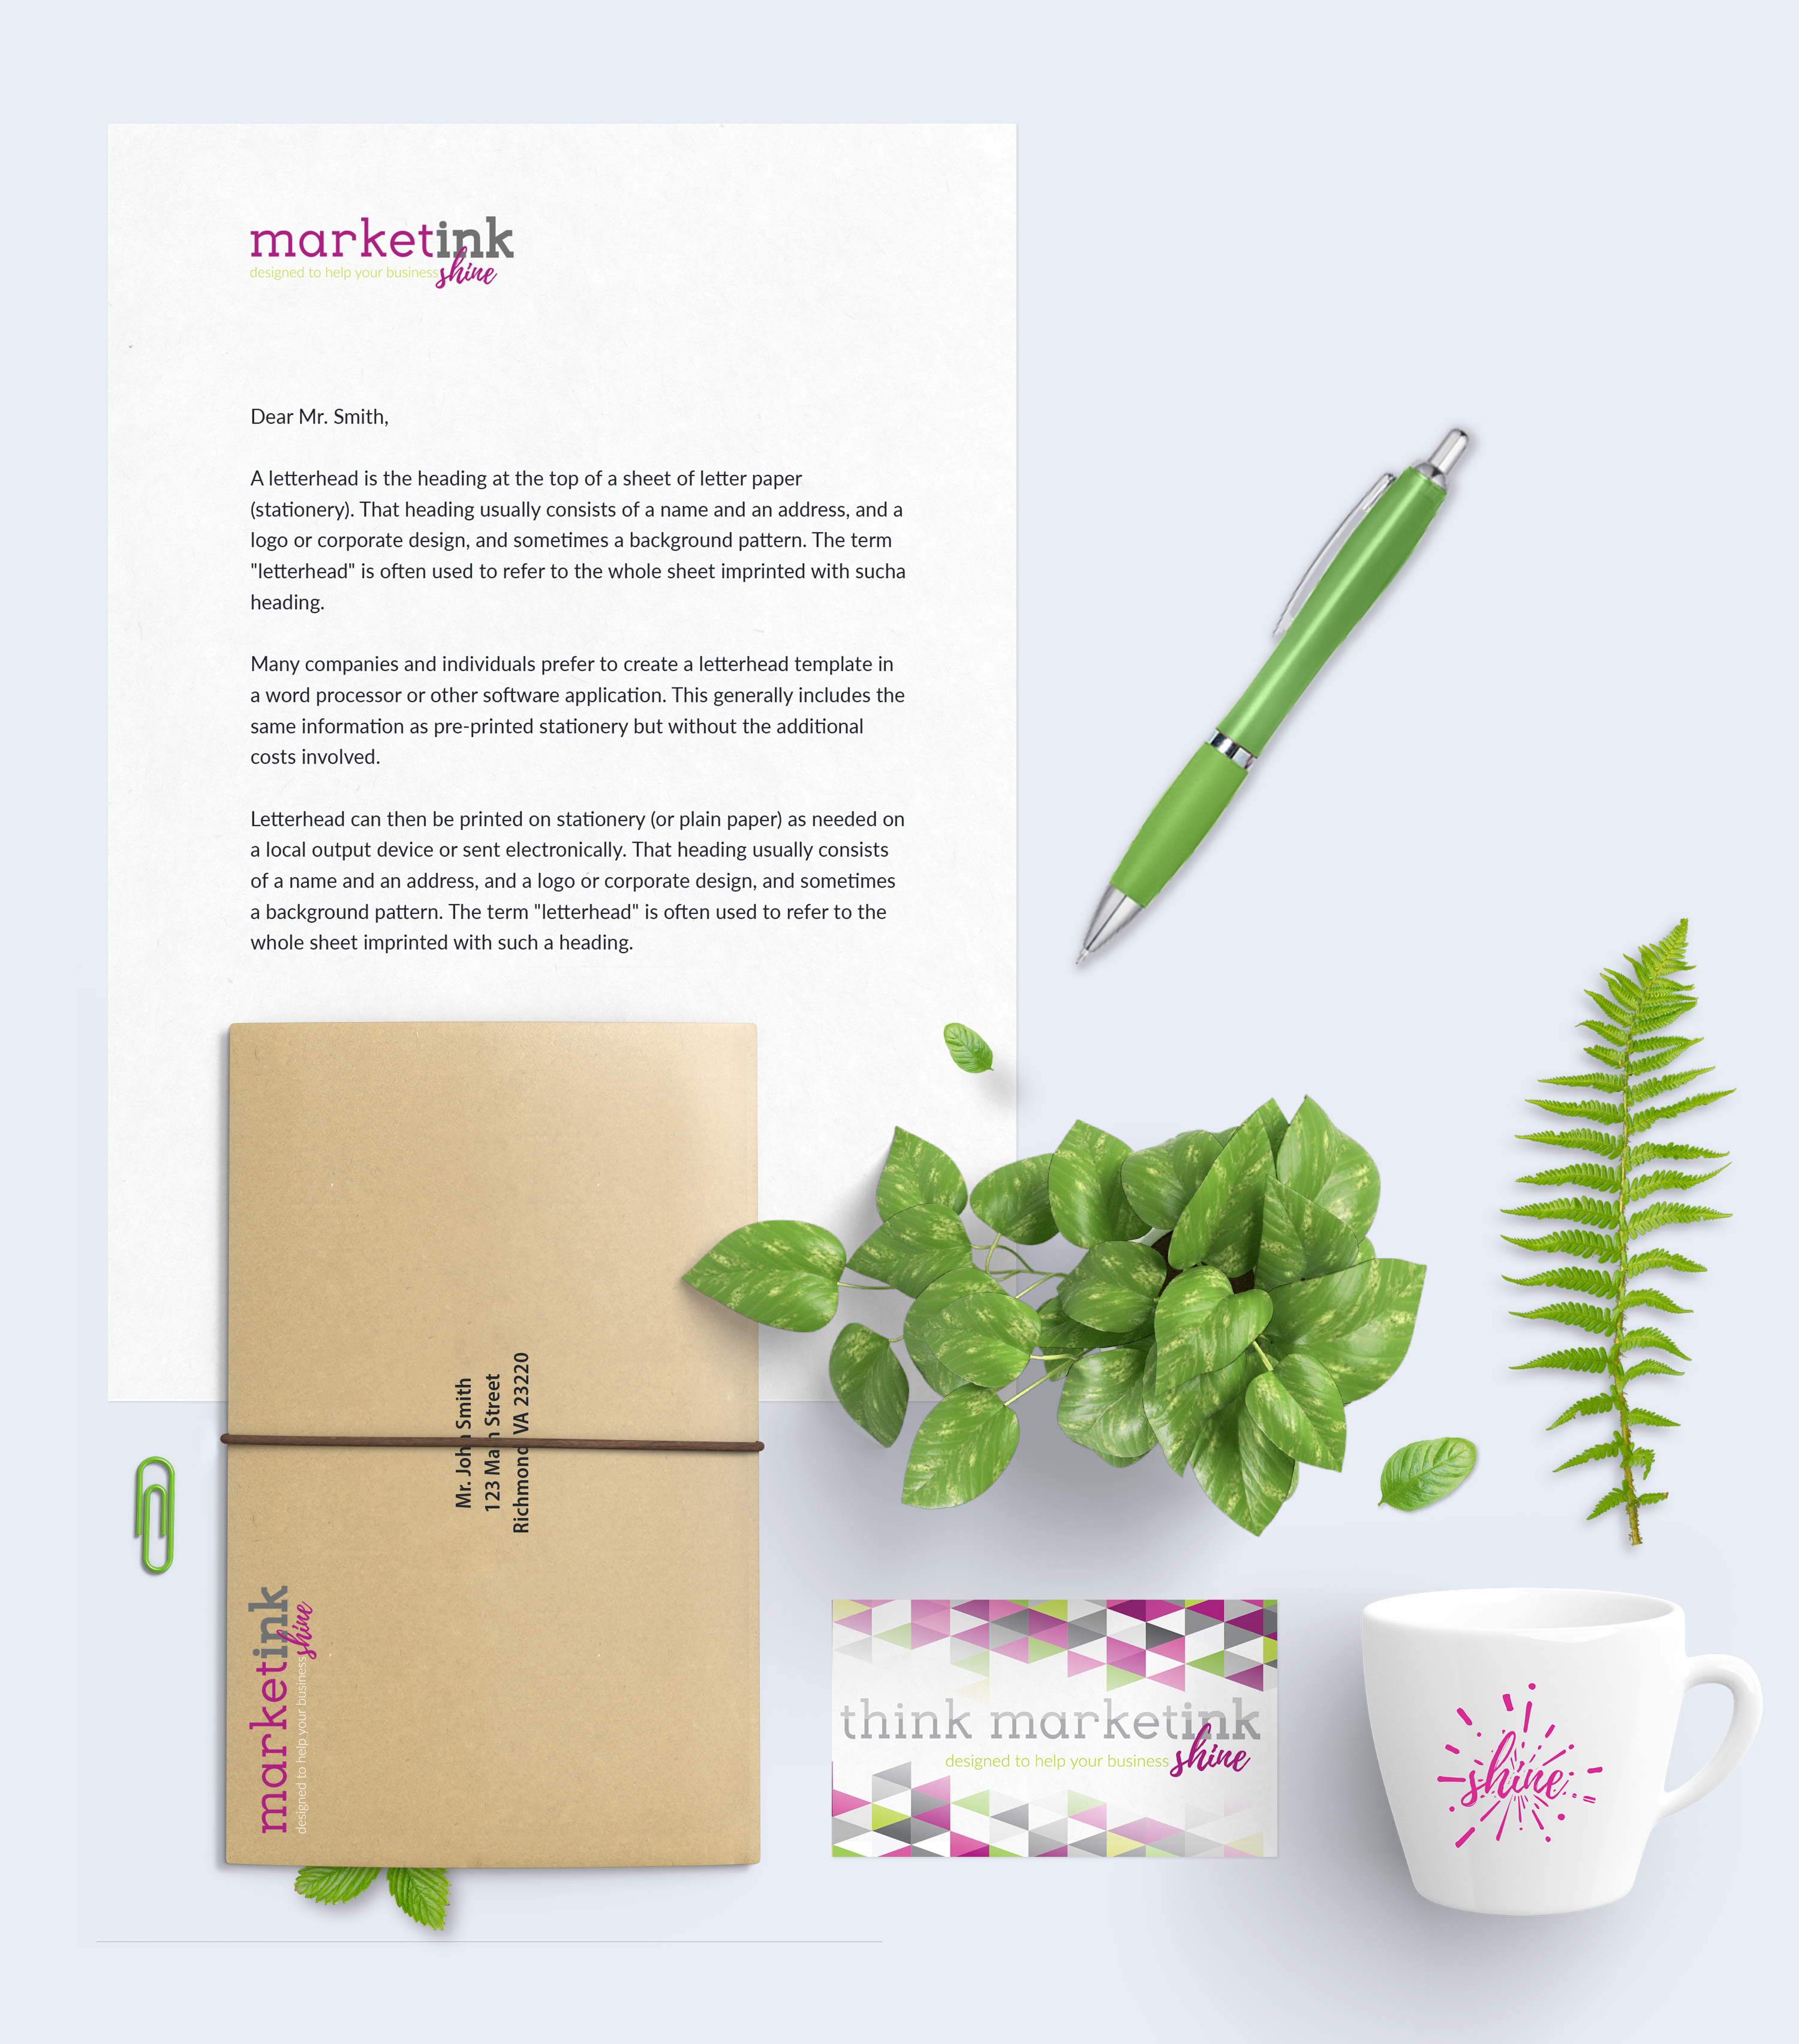 MarketInk - Business Cards & Stationery